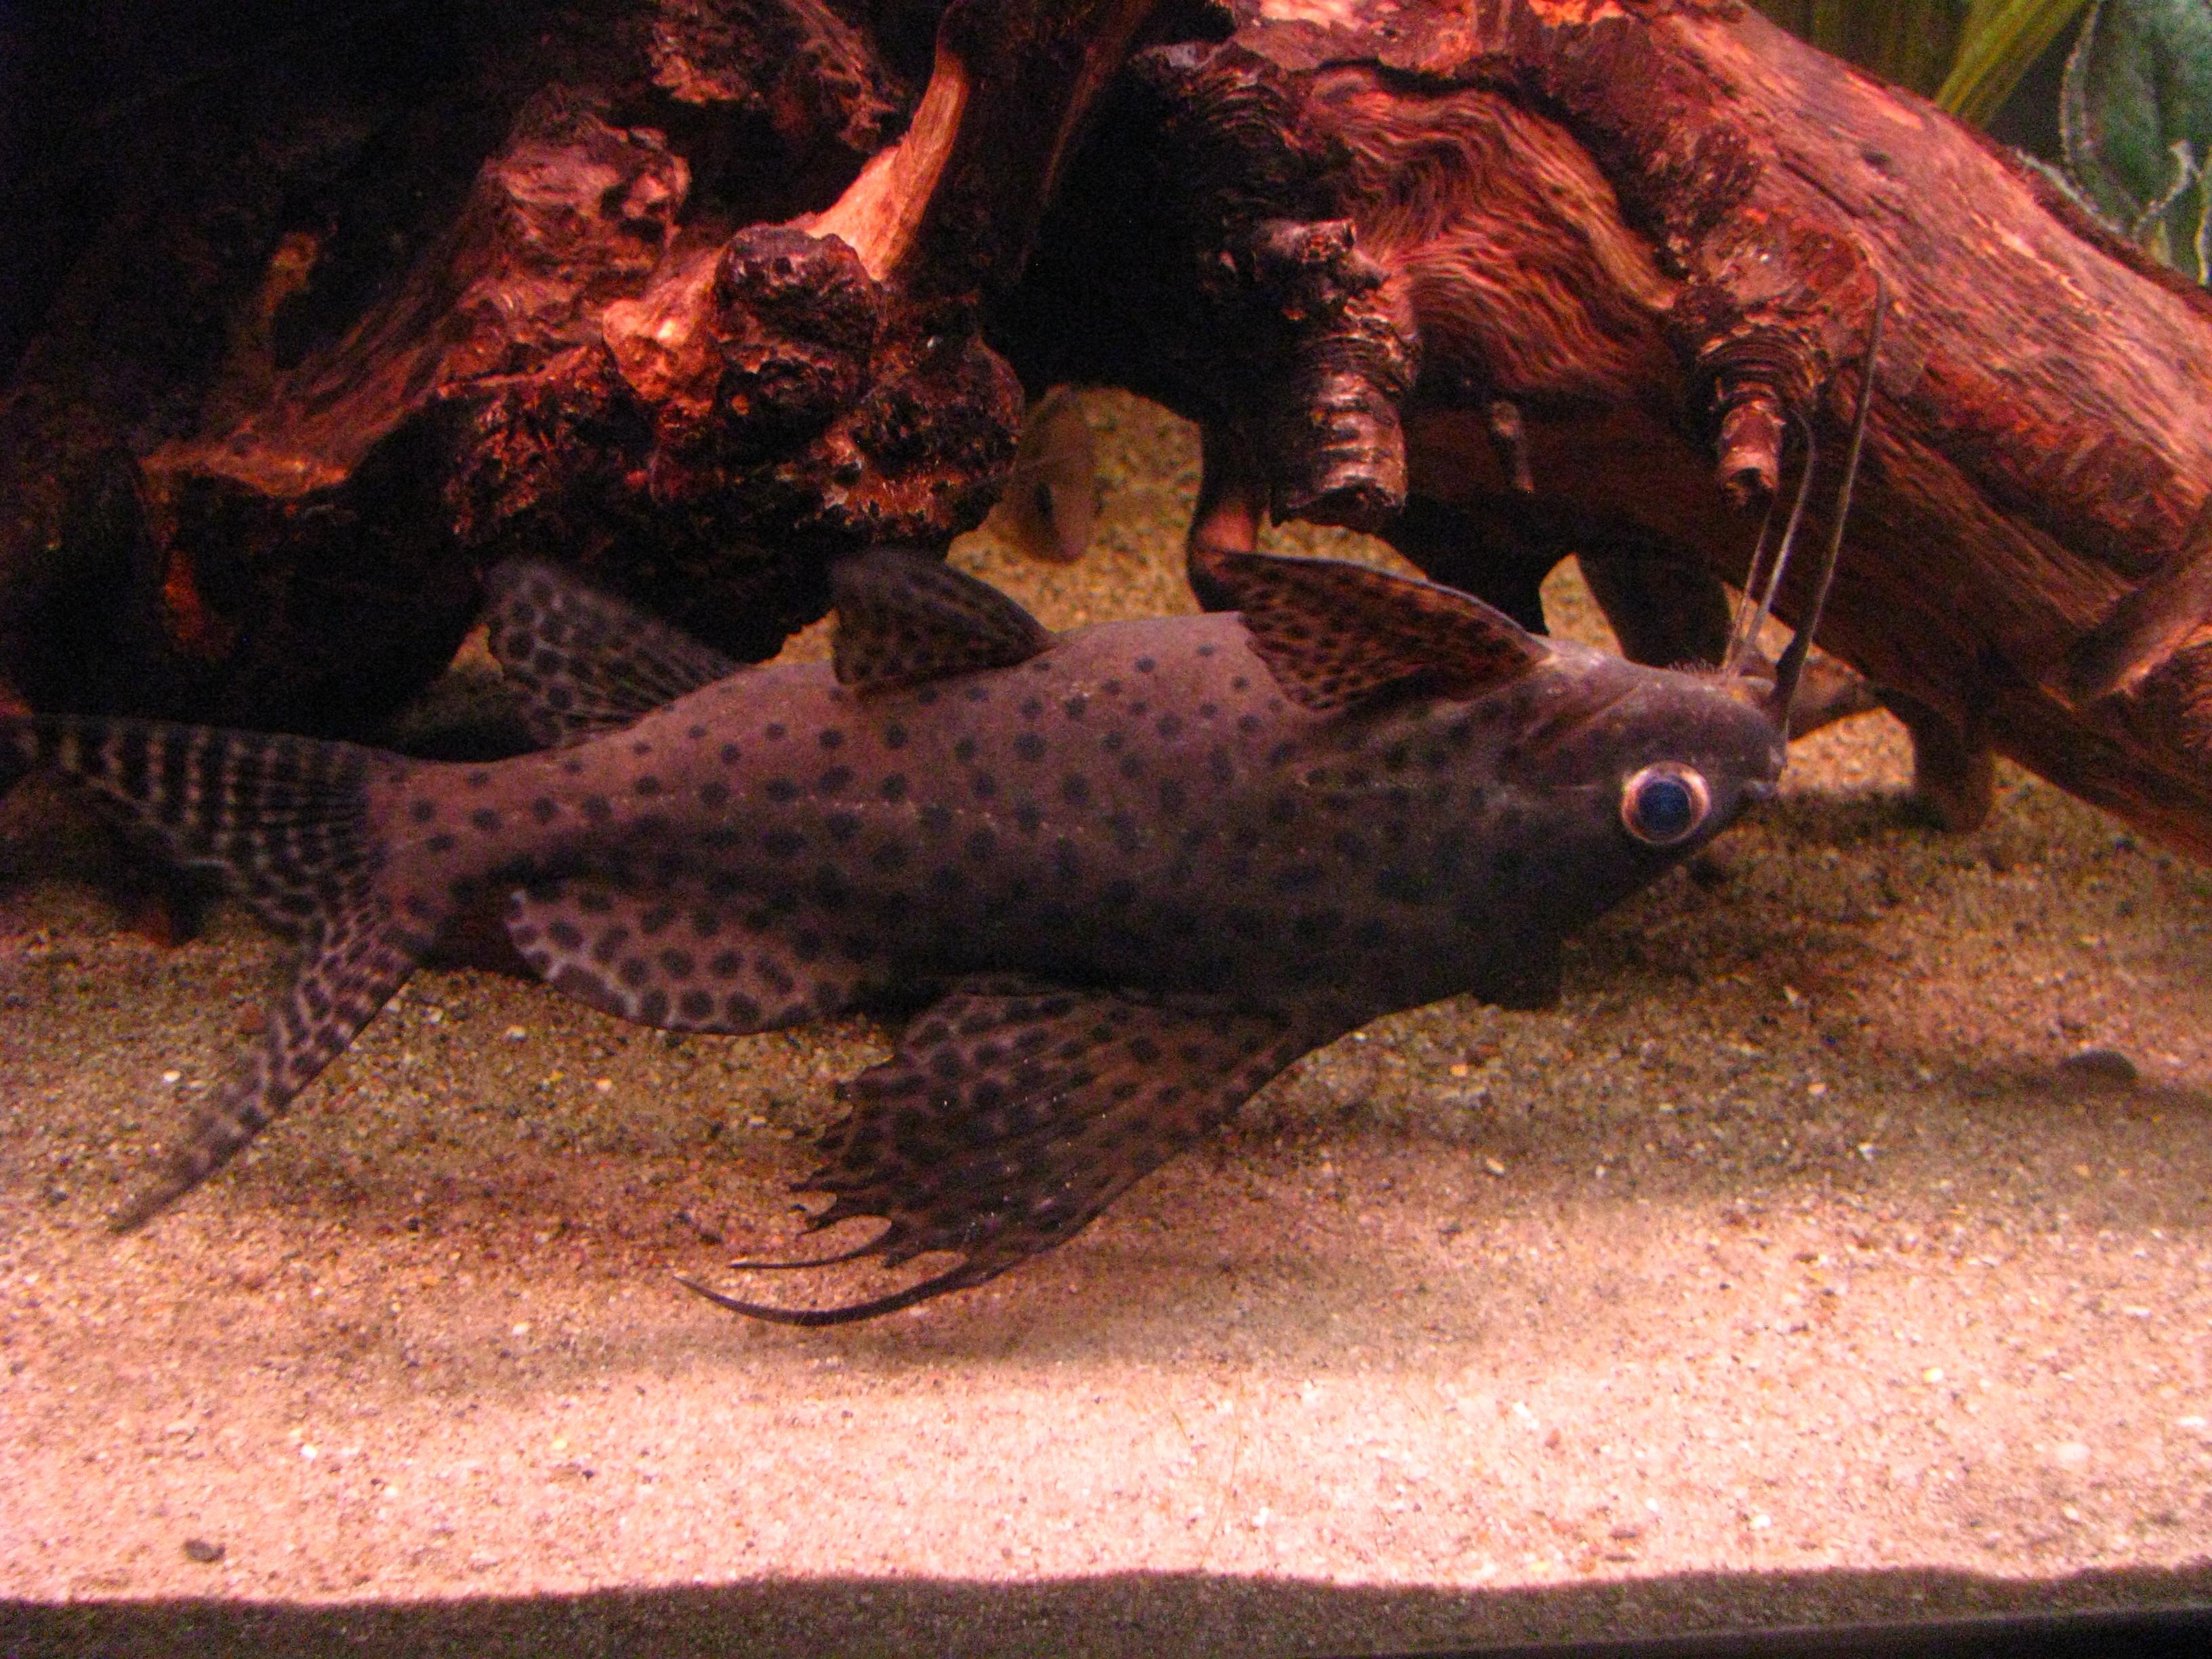 Upside-Down Catfish : cichlids.com: upside down catfish